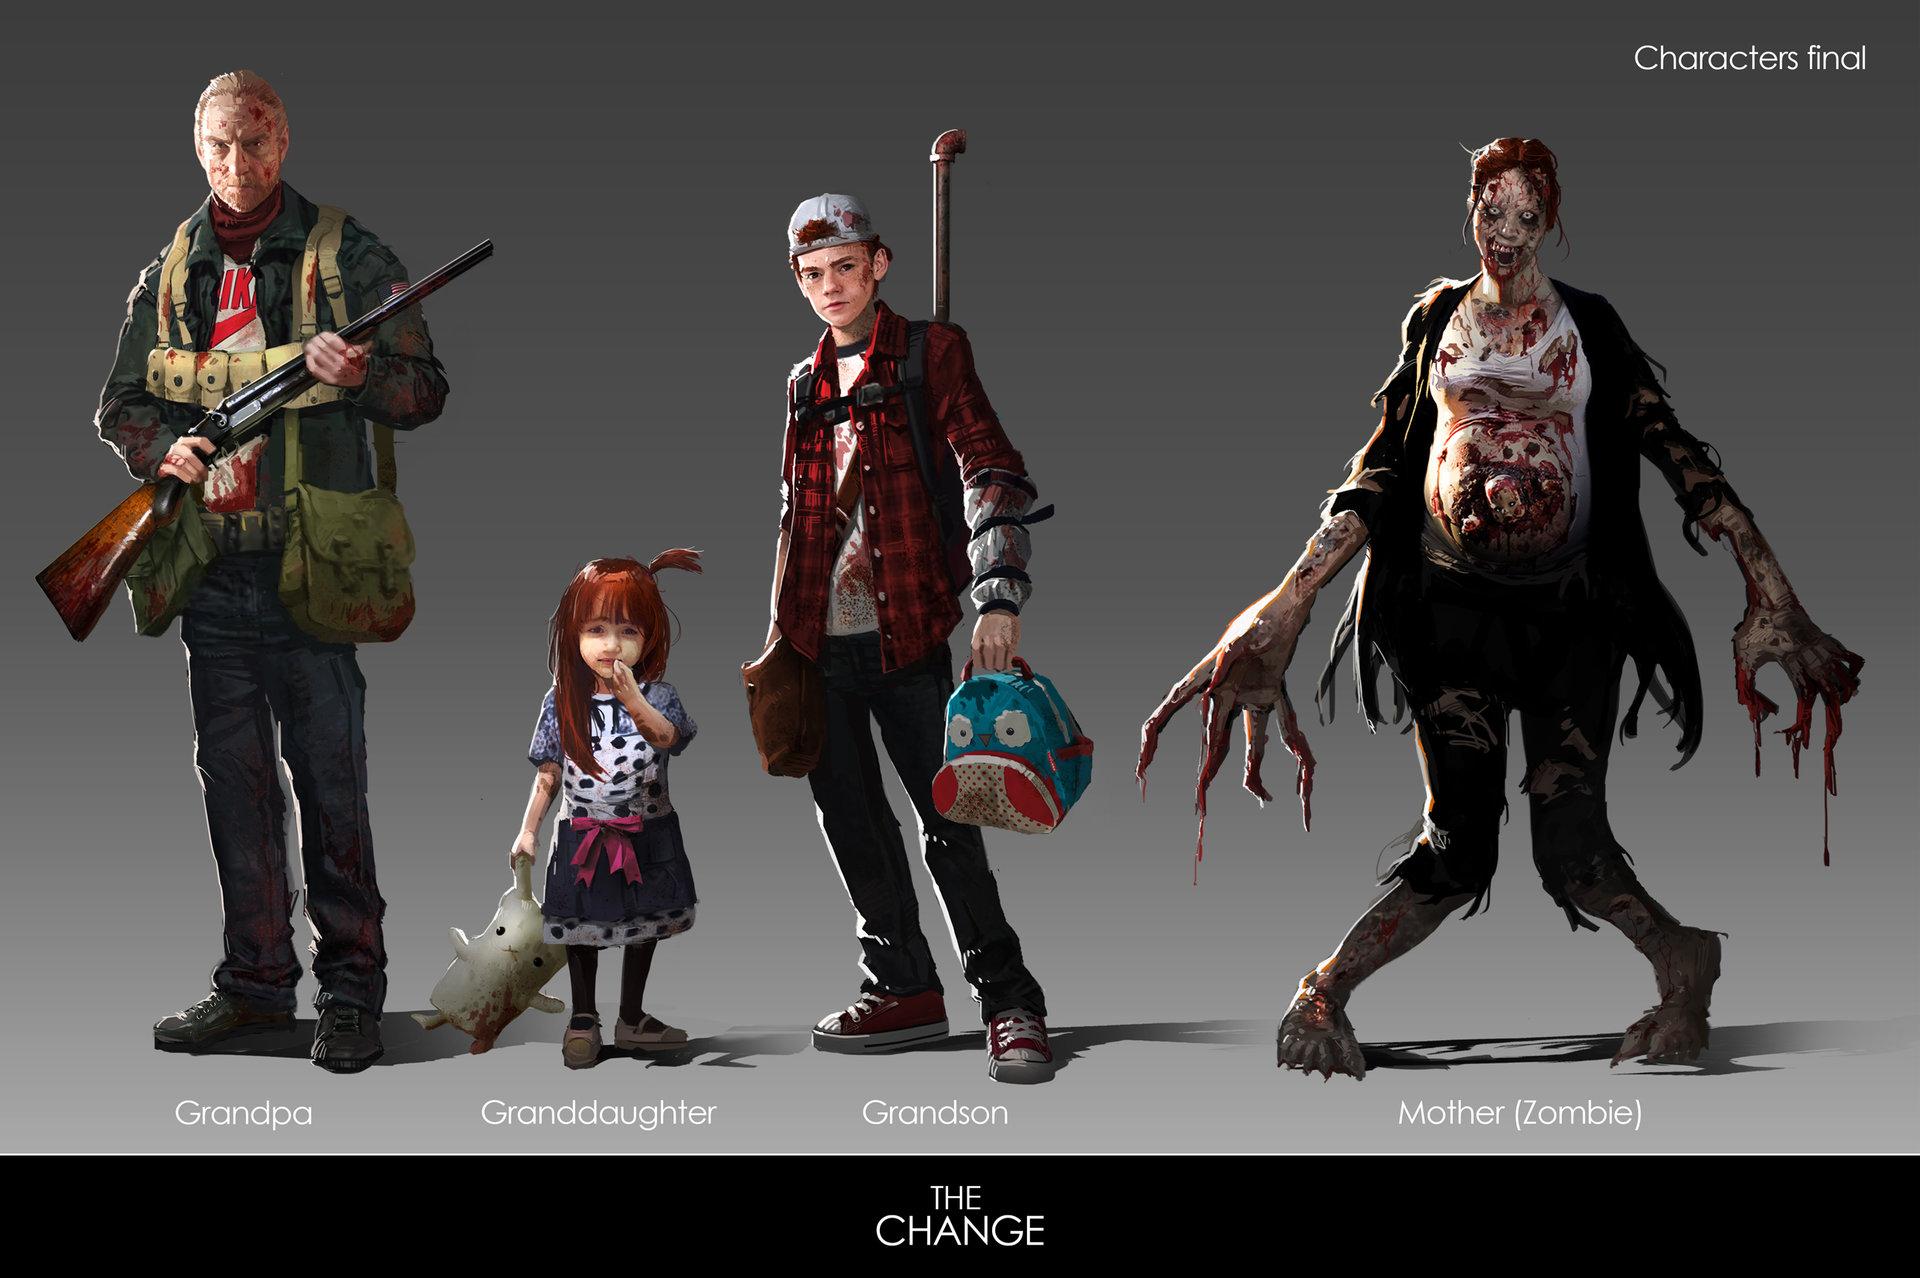 Character Design Zombie : Apocalypse character design images